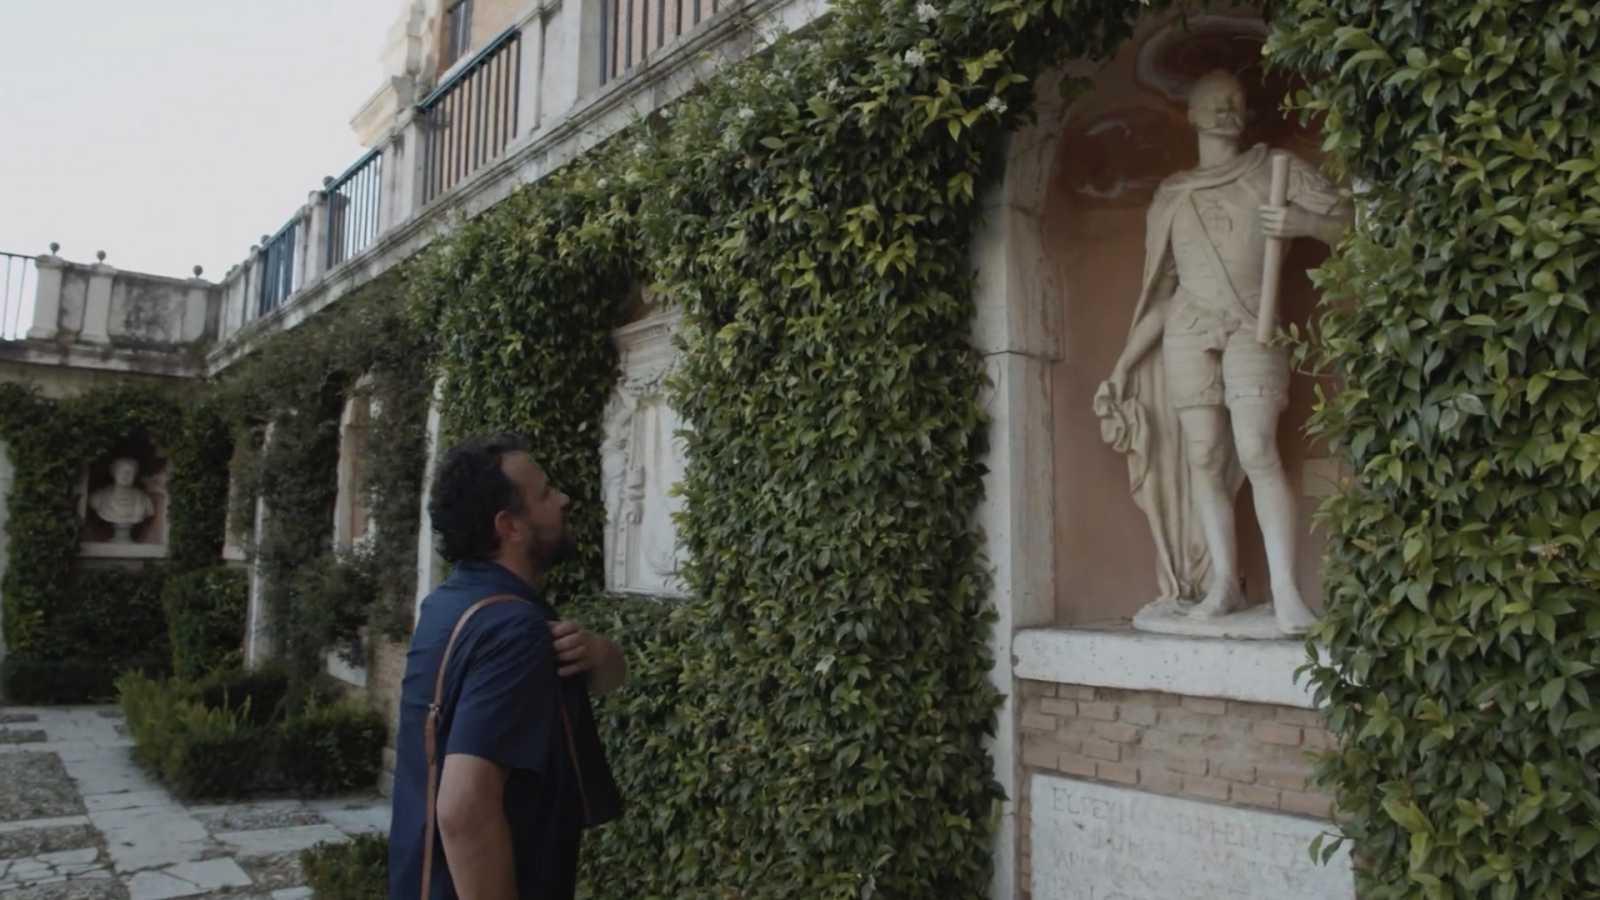 Jardines con historia - Madrid: Aranjuez - ver ahora